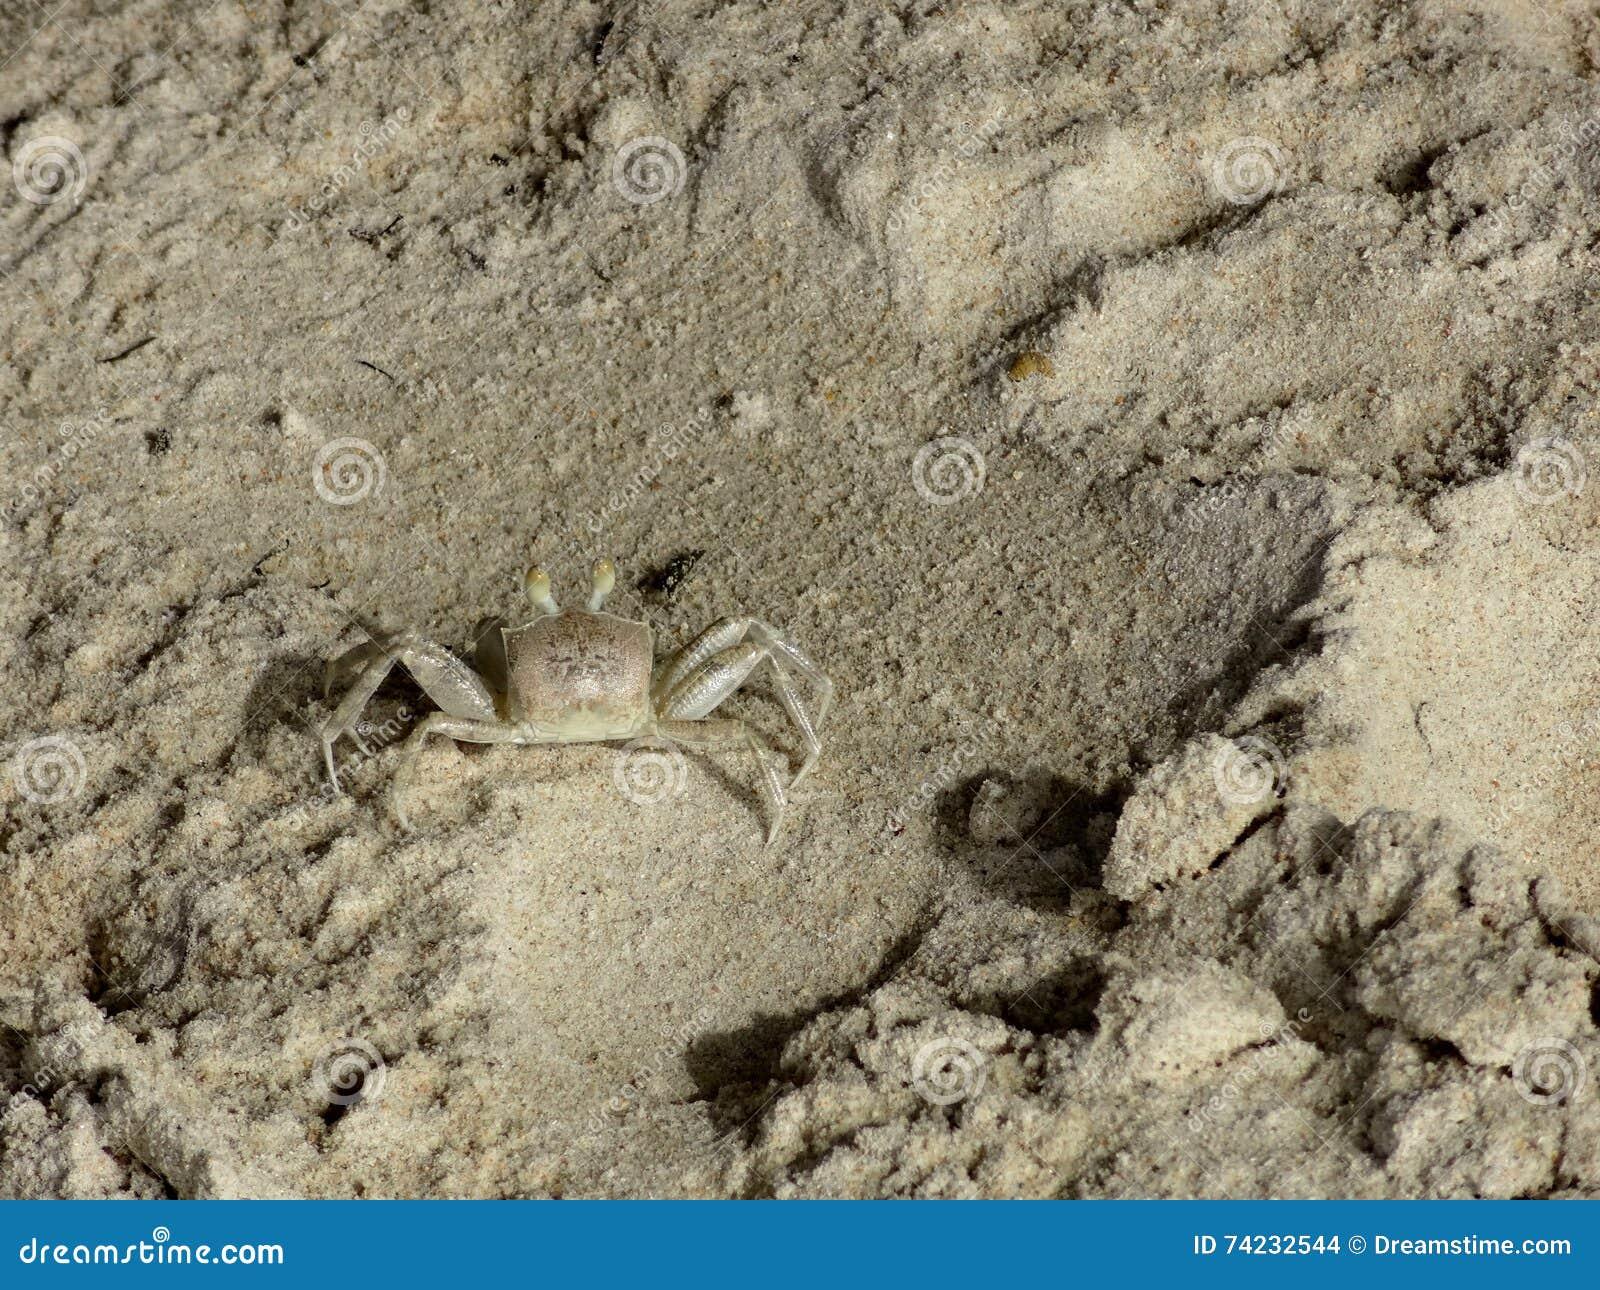 Caranguejo pequeno